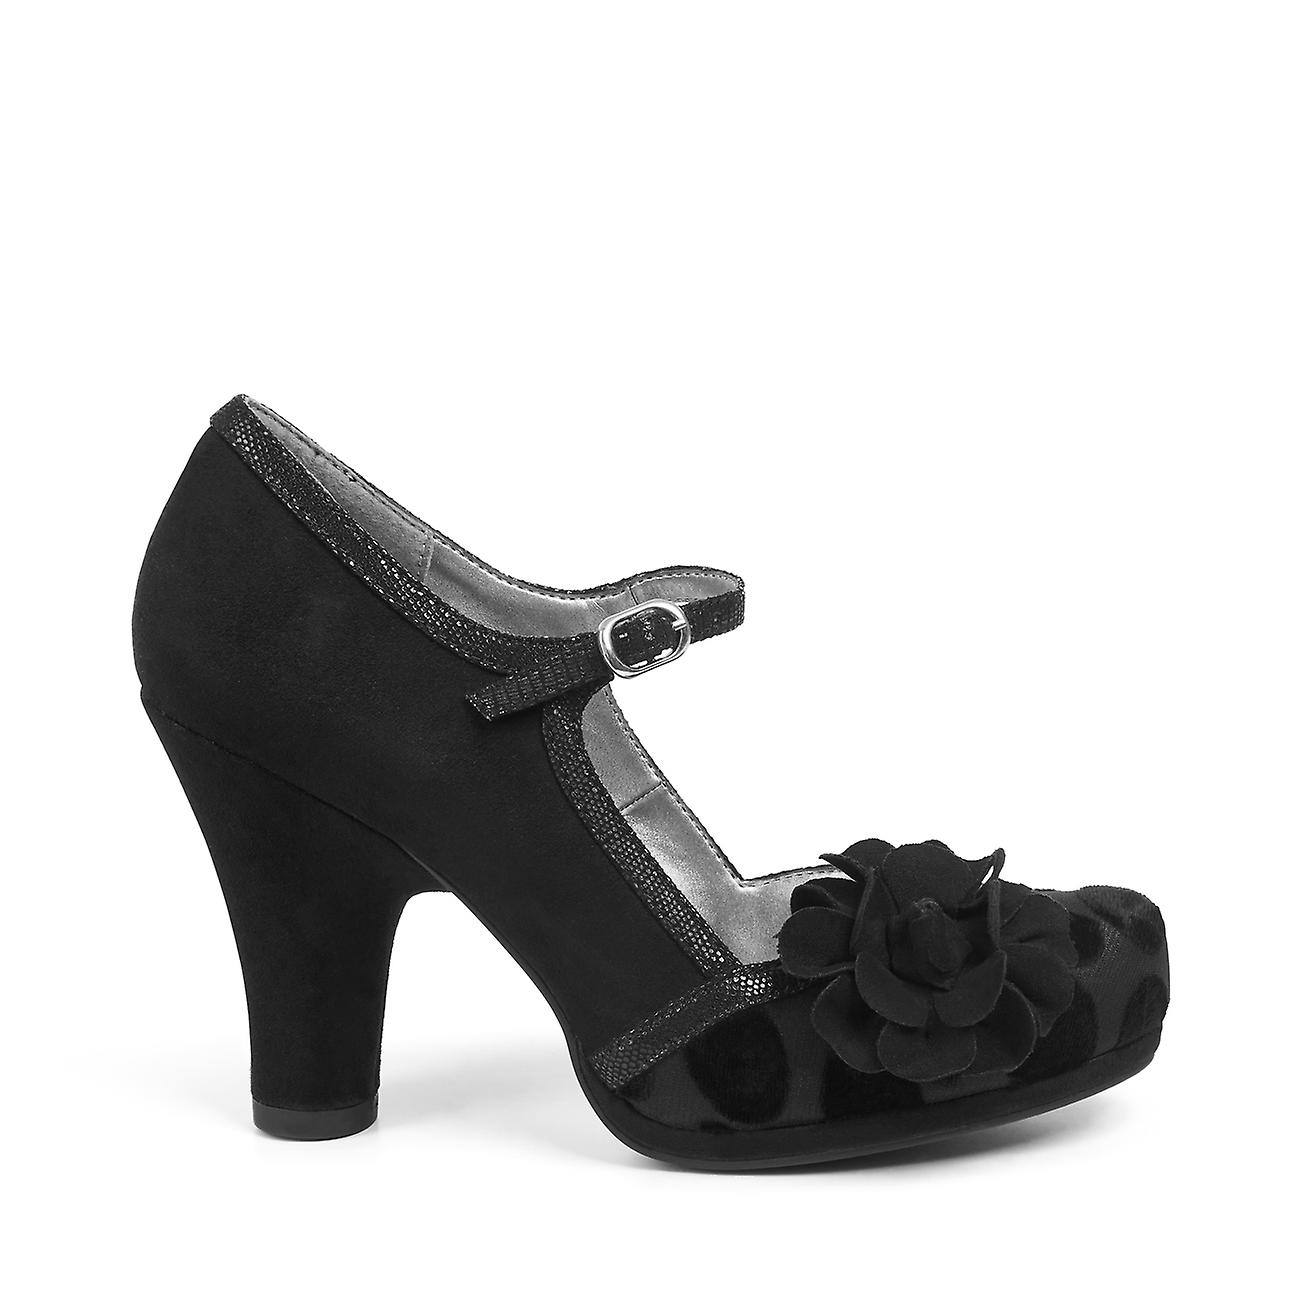 Ruby Shoo Women's Black Spot / Gingham Hannah Mary Jane Bar Shoes